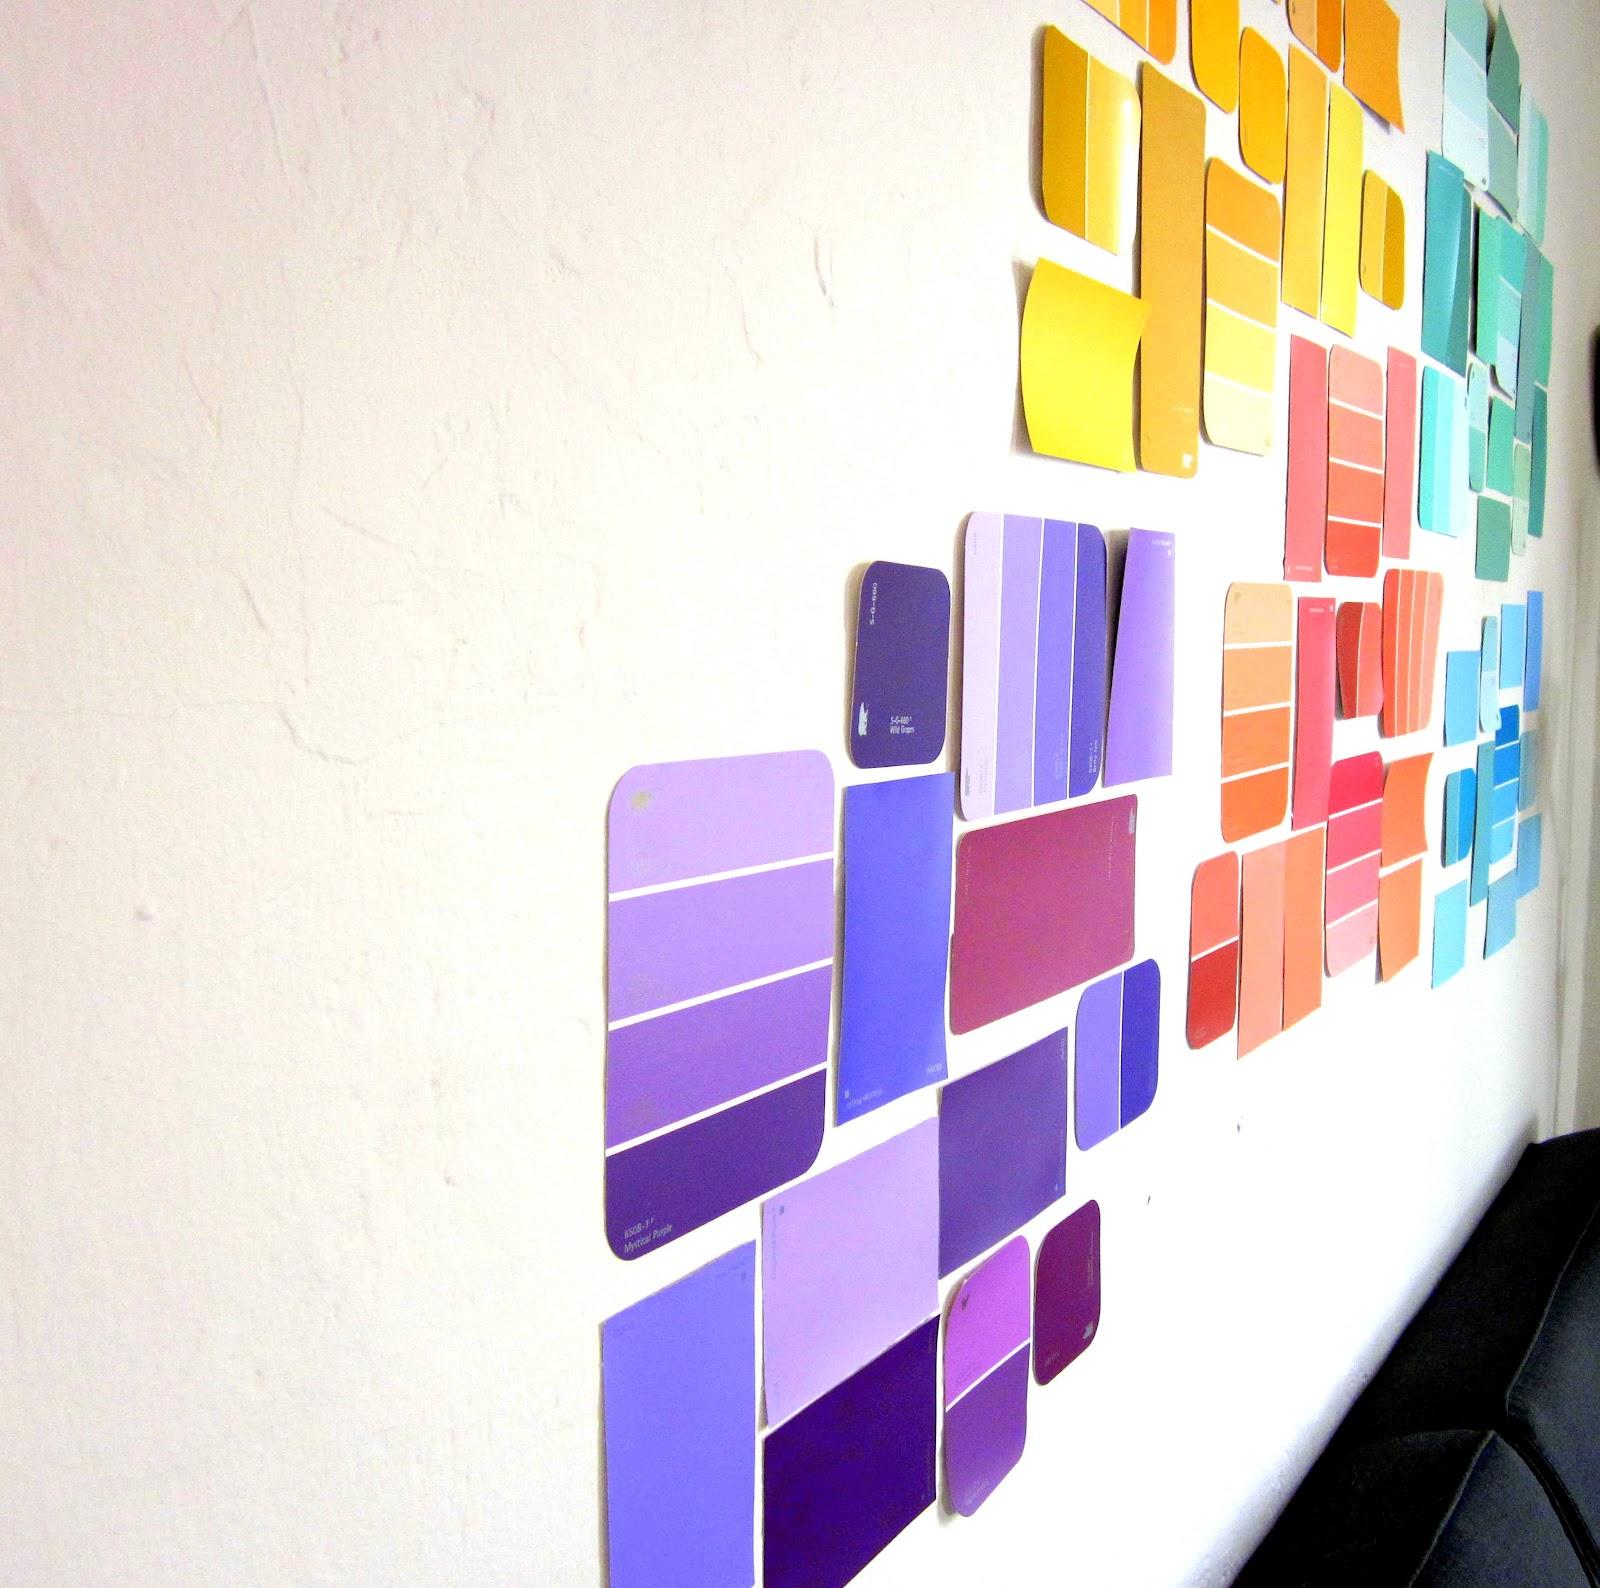 Paint Chip Wall Art & Just A Smidge: Paint Chip Wall Art